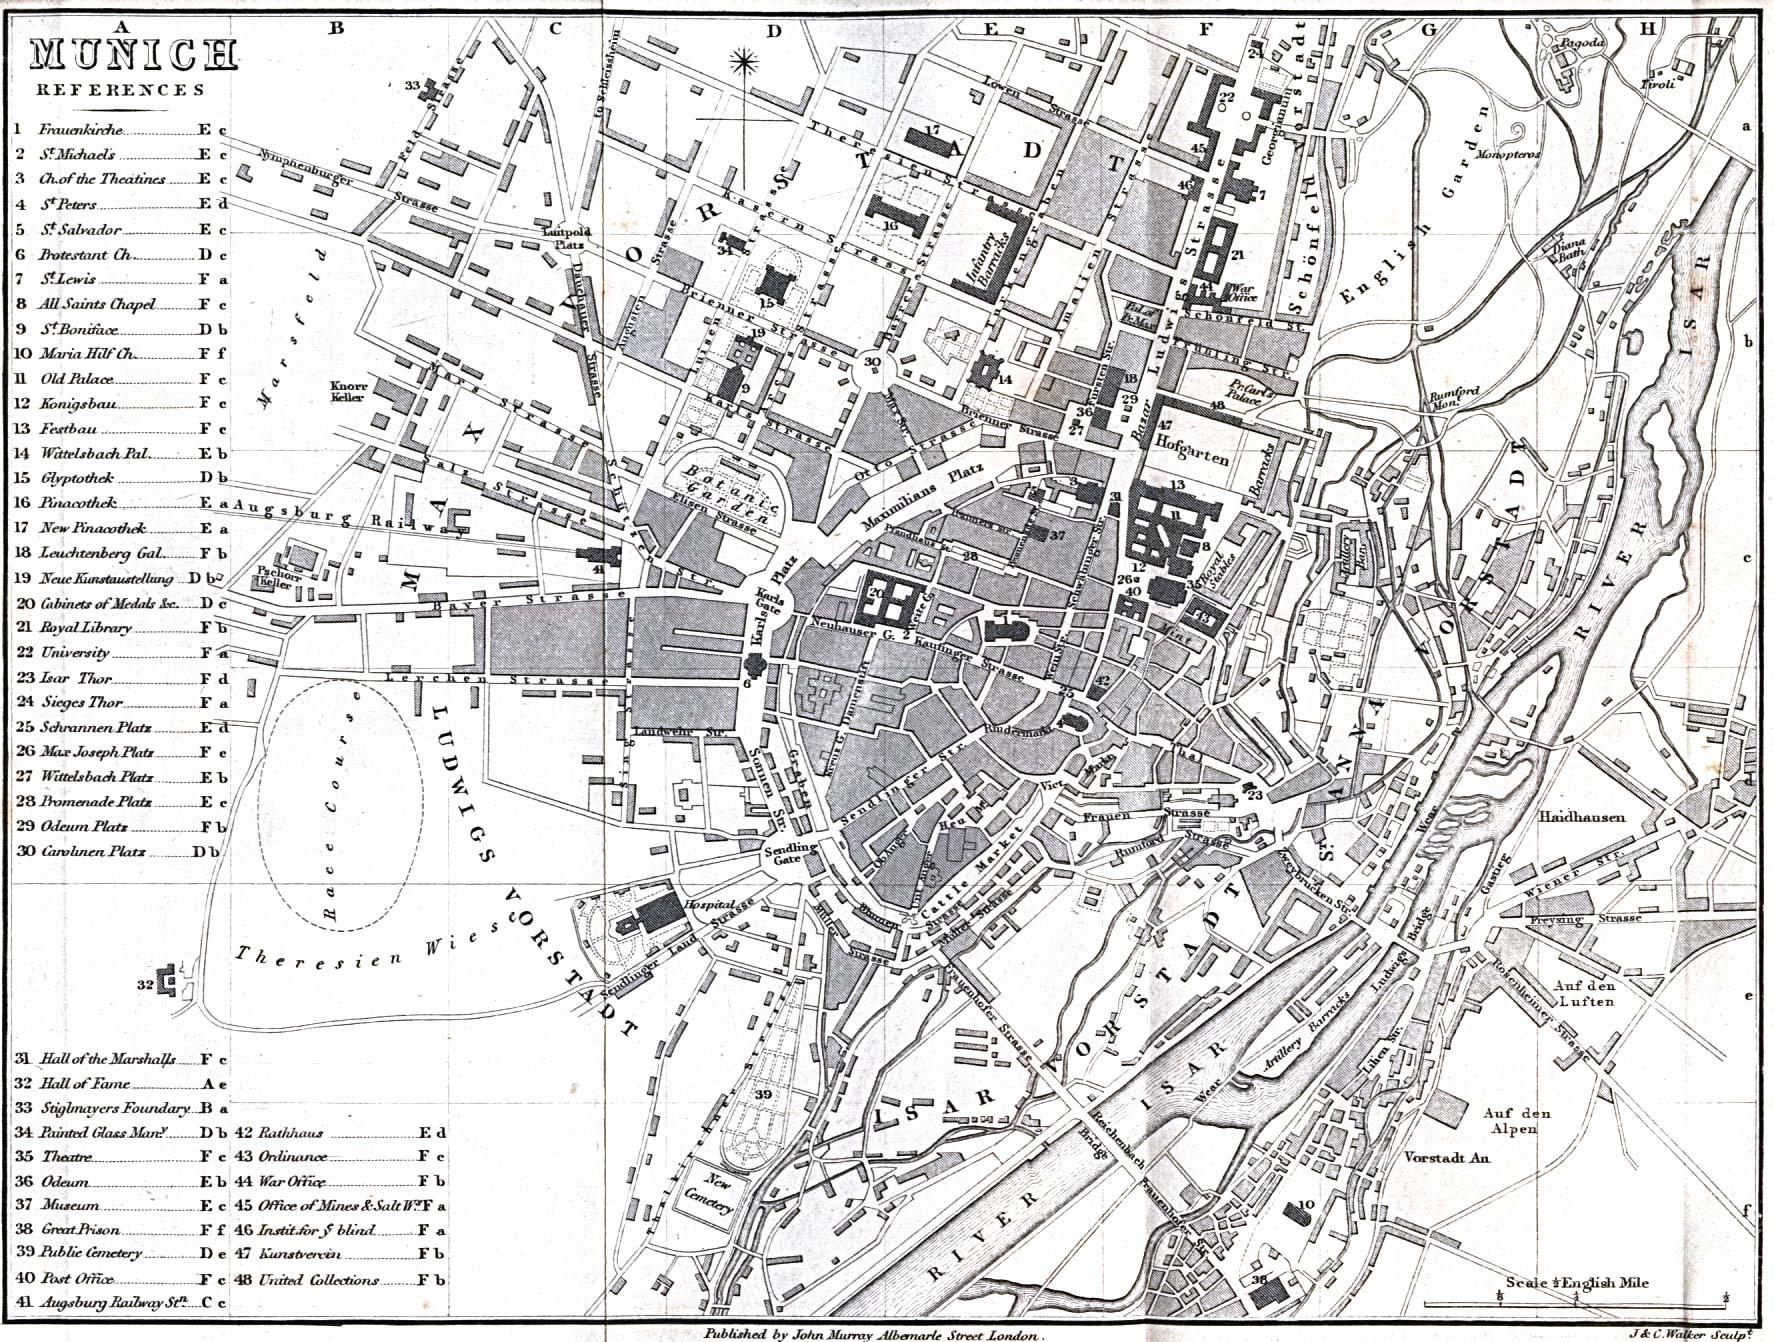 Mapa de Múnich, Alemania 1858